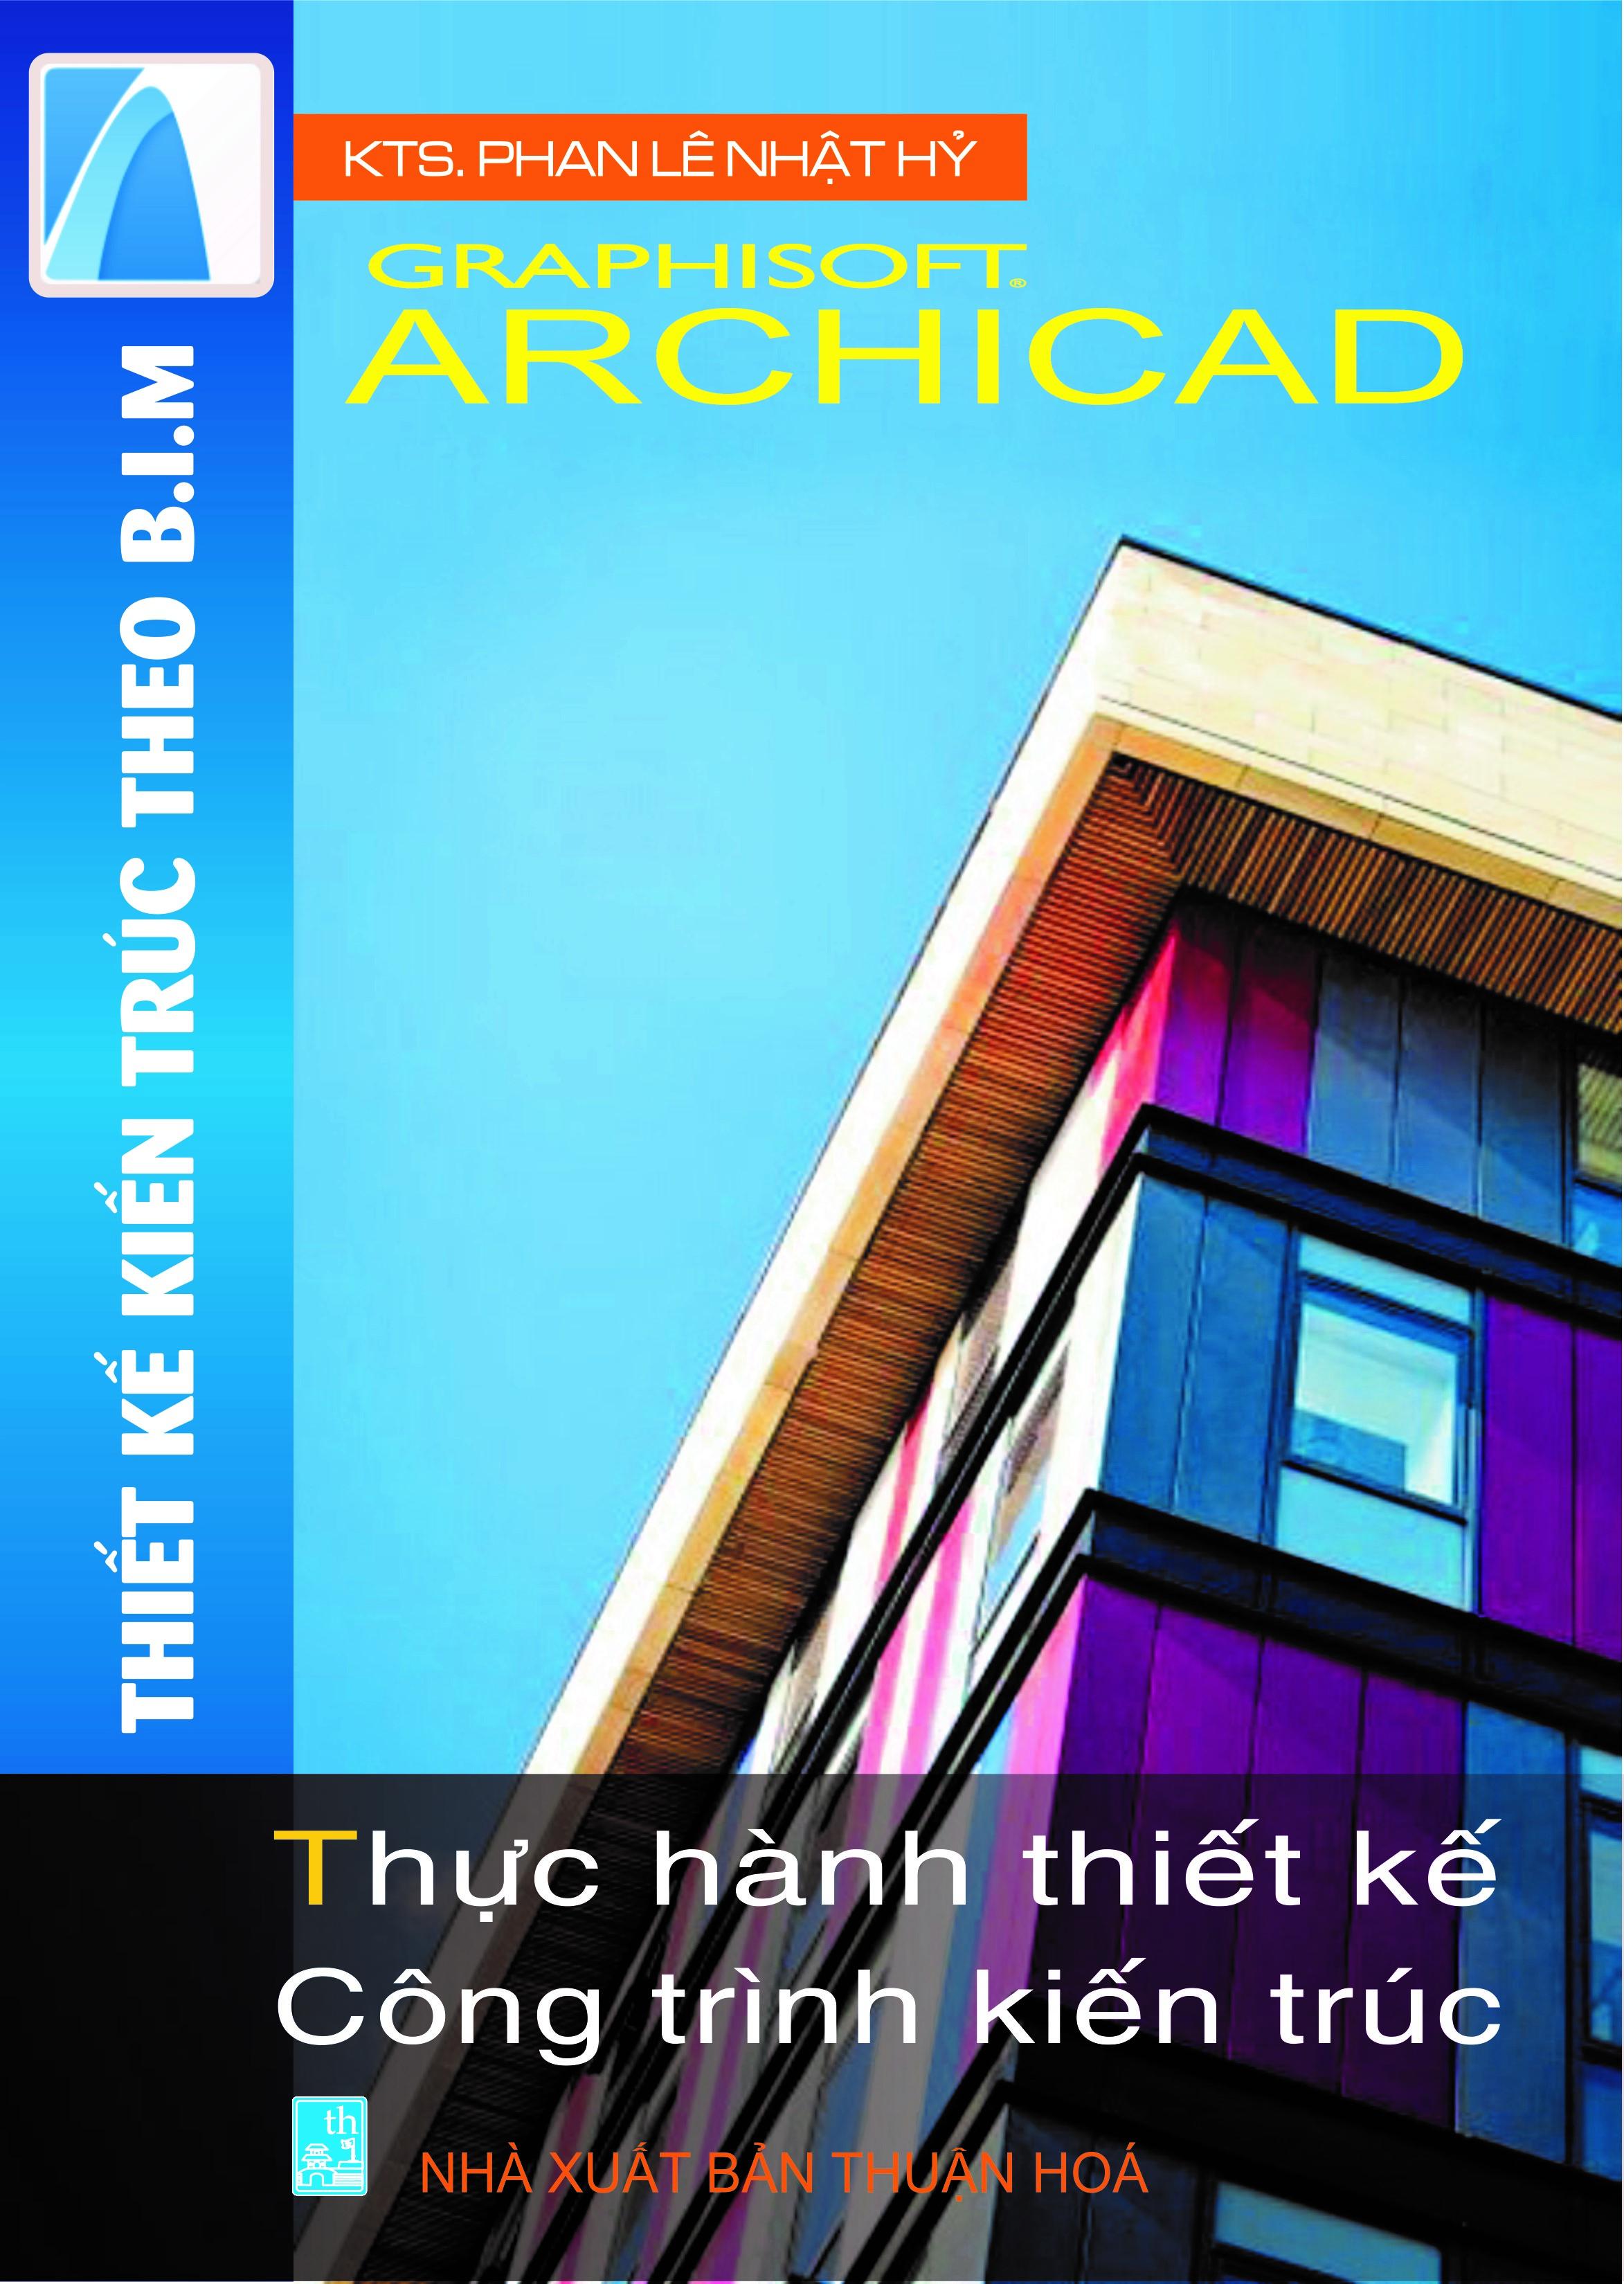 BIA SACH ARCHICAD edit.jpg (1.49 MB)